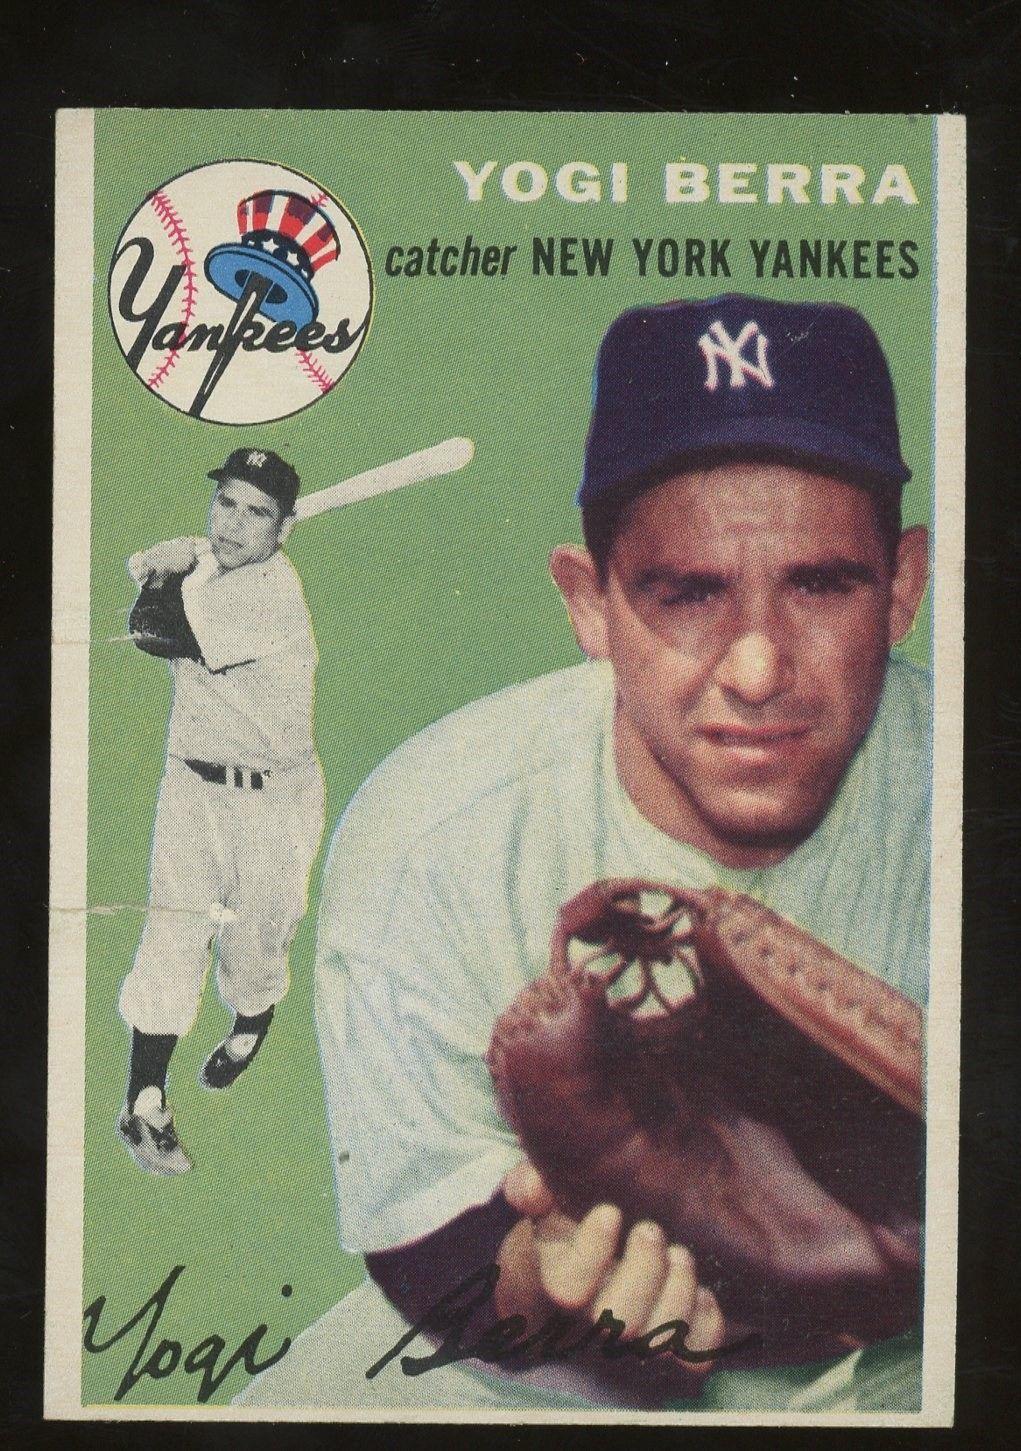 1954 Topps 50 Yogi Berra New York Yankees Hof Baseballcards Baseball Cards Old Baseball Cards Baseball Trading Cards